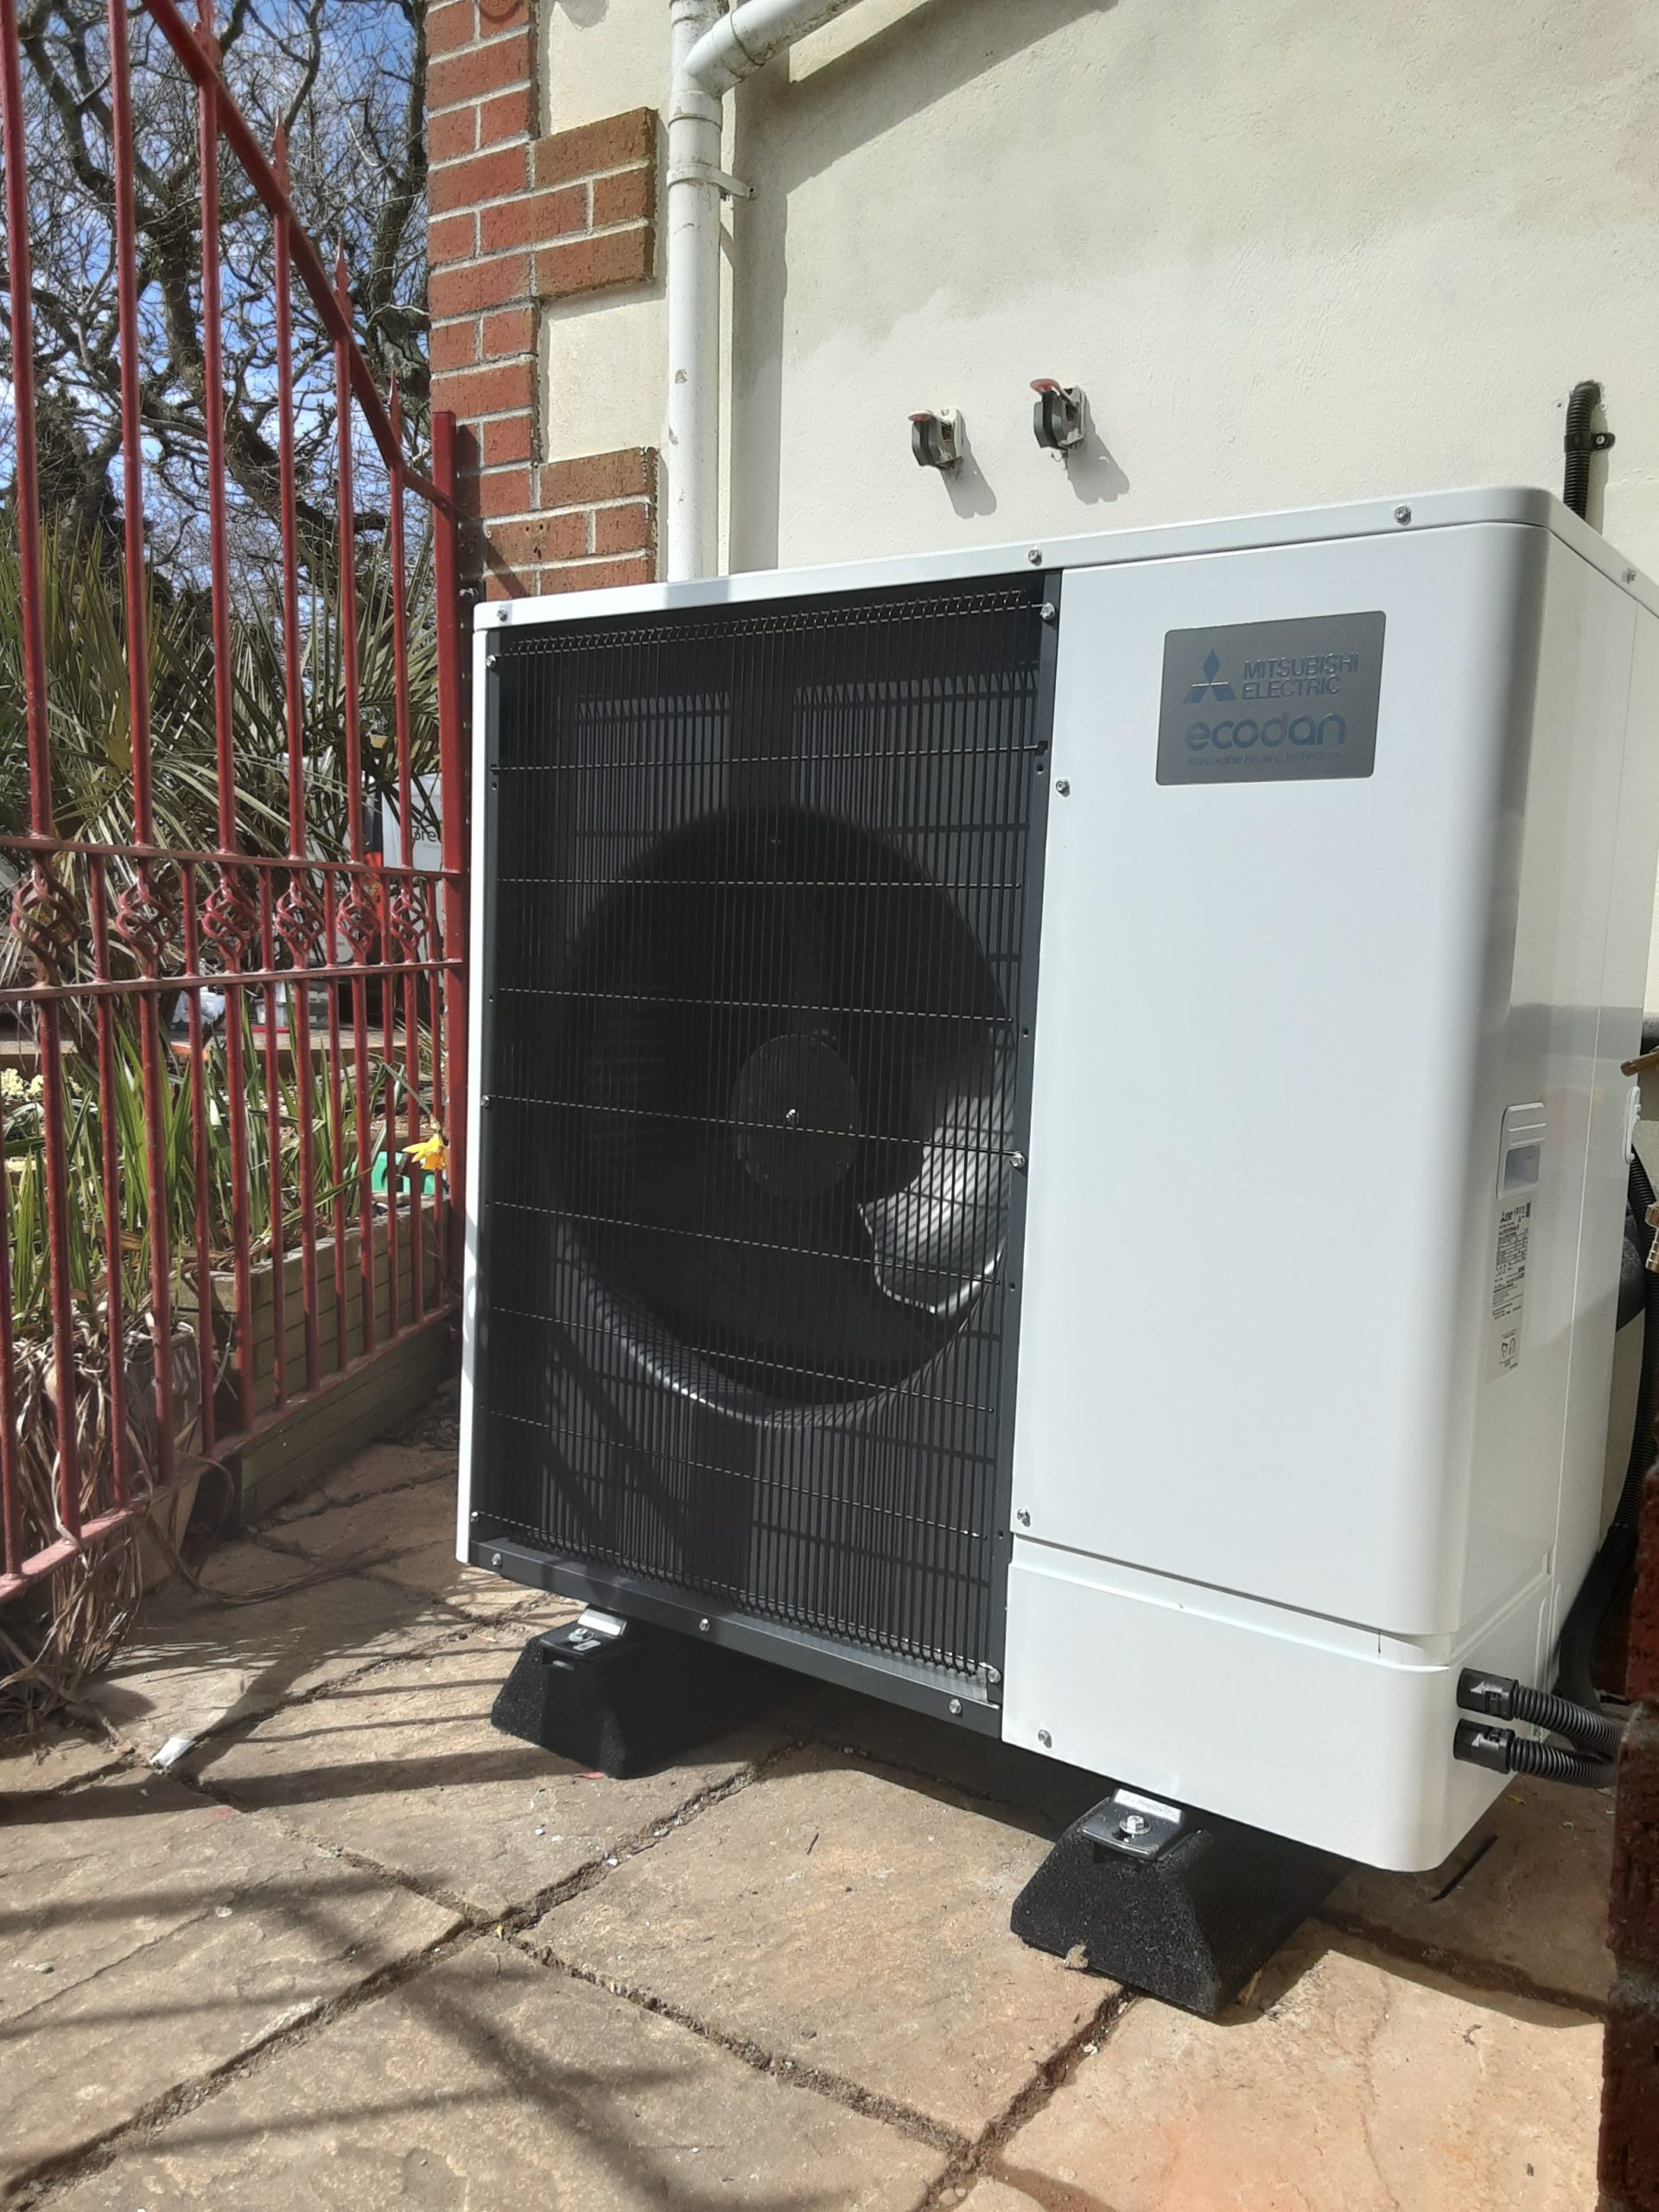 An 11.2kW Mitsubishi Ecodan installation undertaken by GreenGenUK in Polperro, Cornwall.